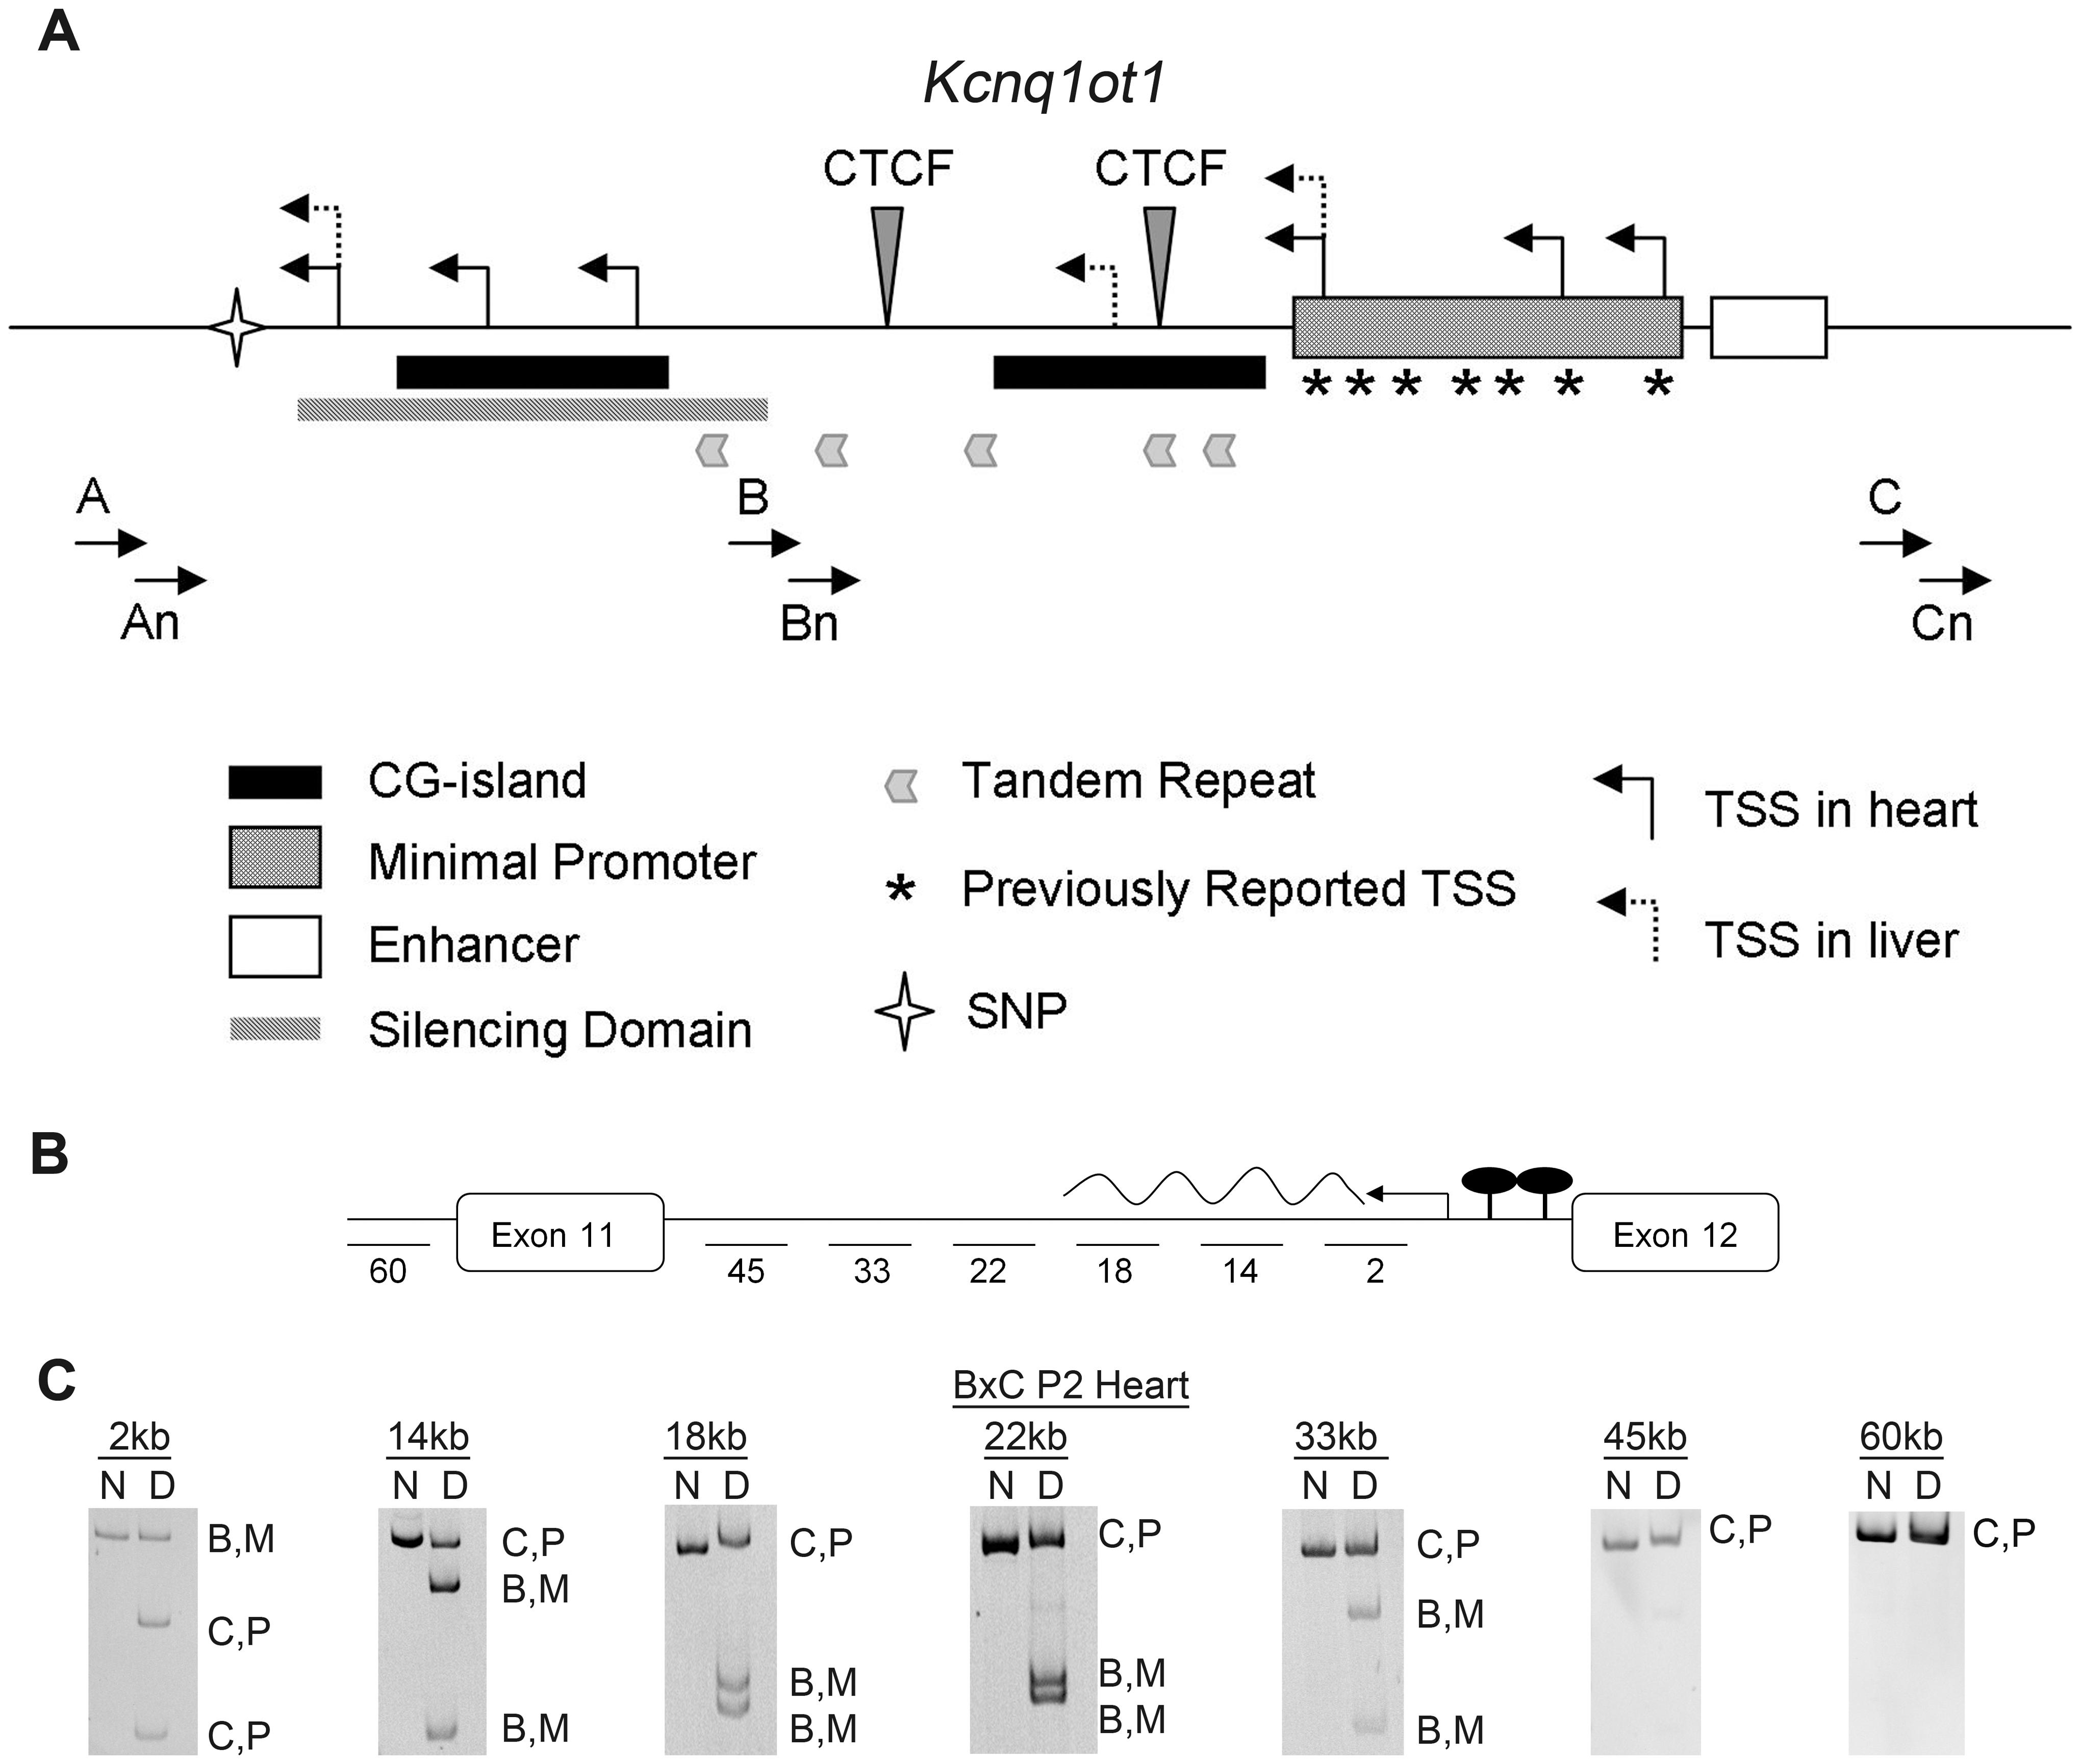 Characterization of the maternal <i>Kcnq1ot1</i> transcript.